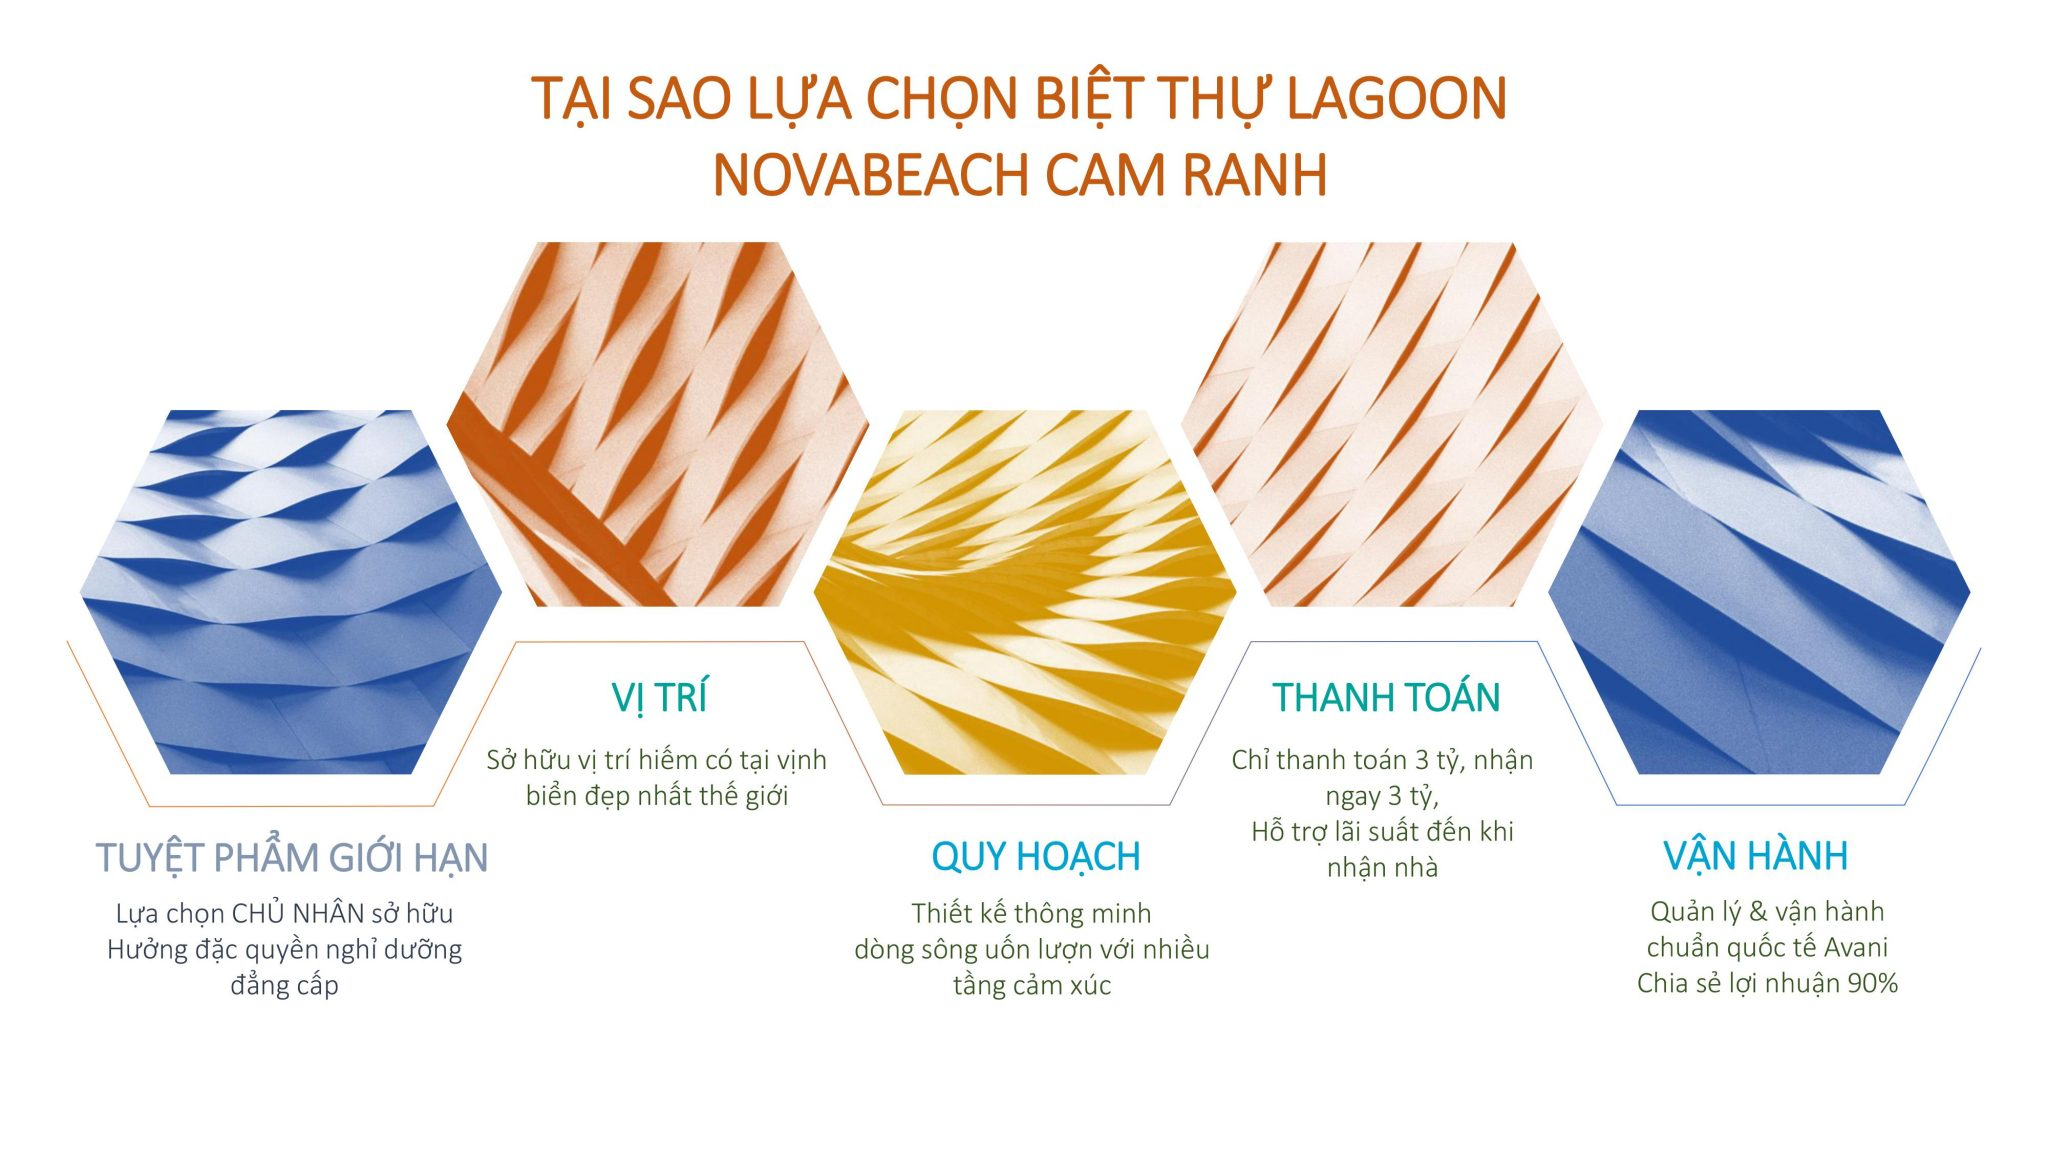 Mua biệt thự Lagoon Novabeach Cam Ranh